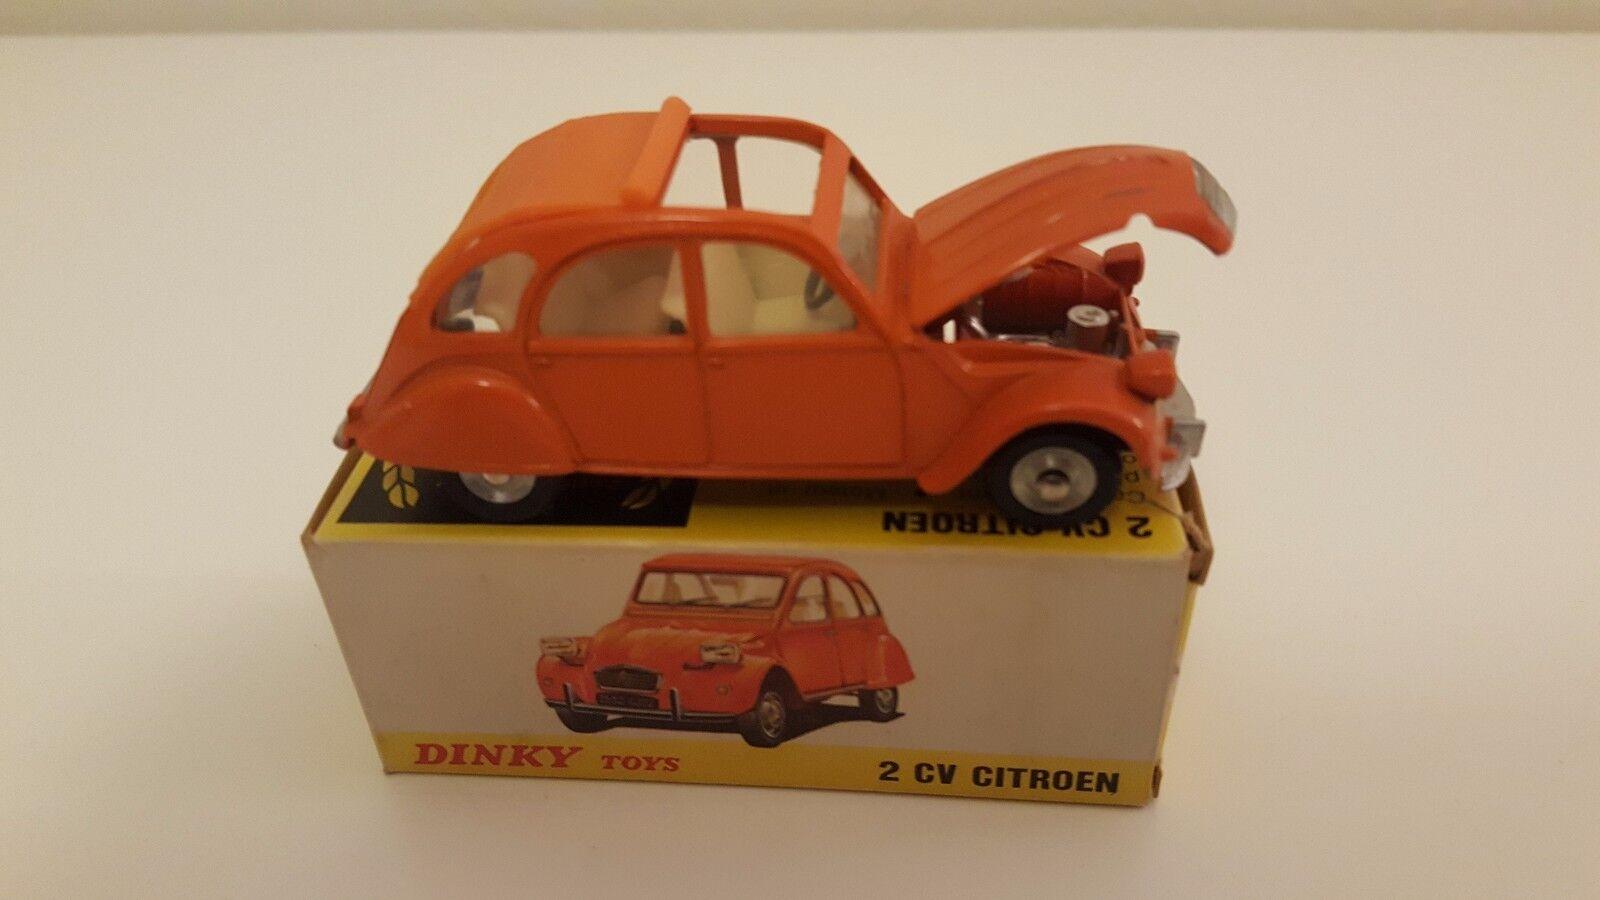 Dinky Toys (Spain) - 01 500 - Citroën 2 CV en boîte d'origine VN MIB